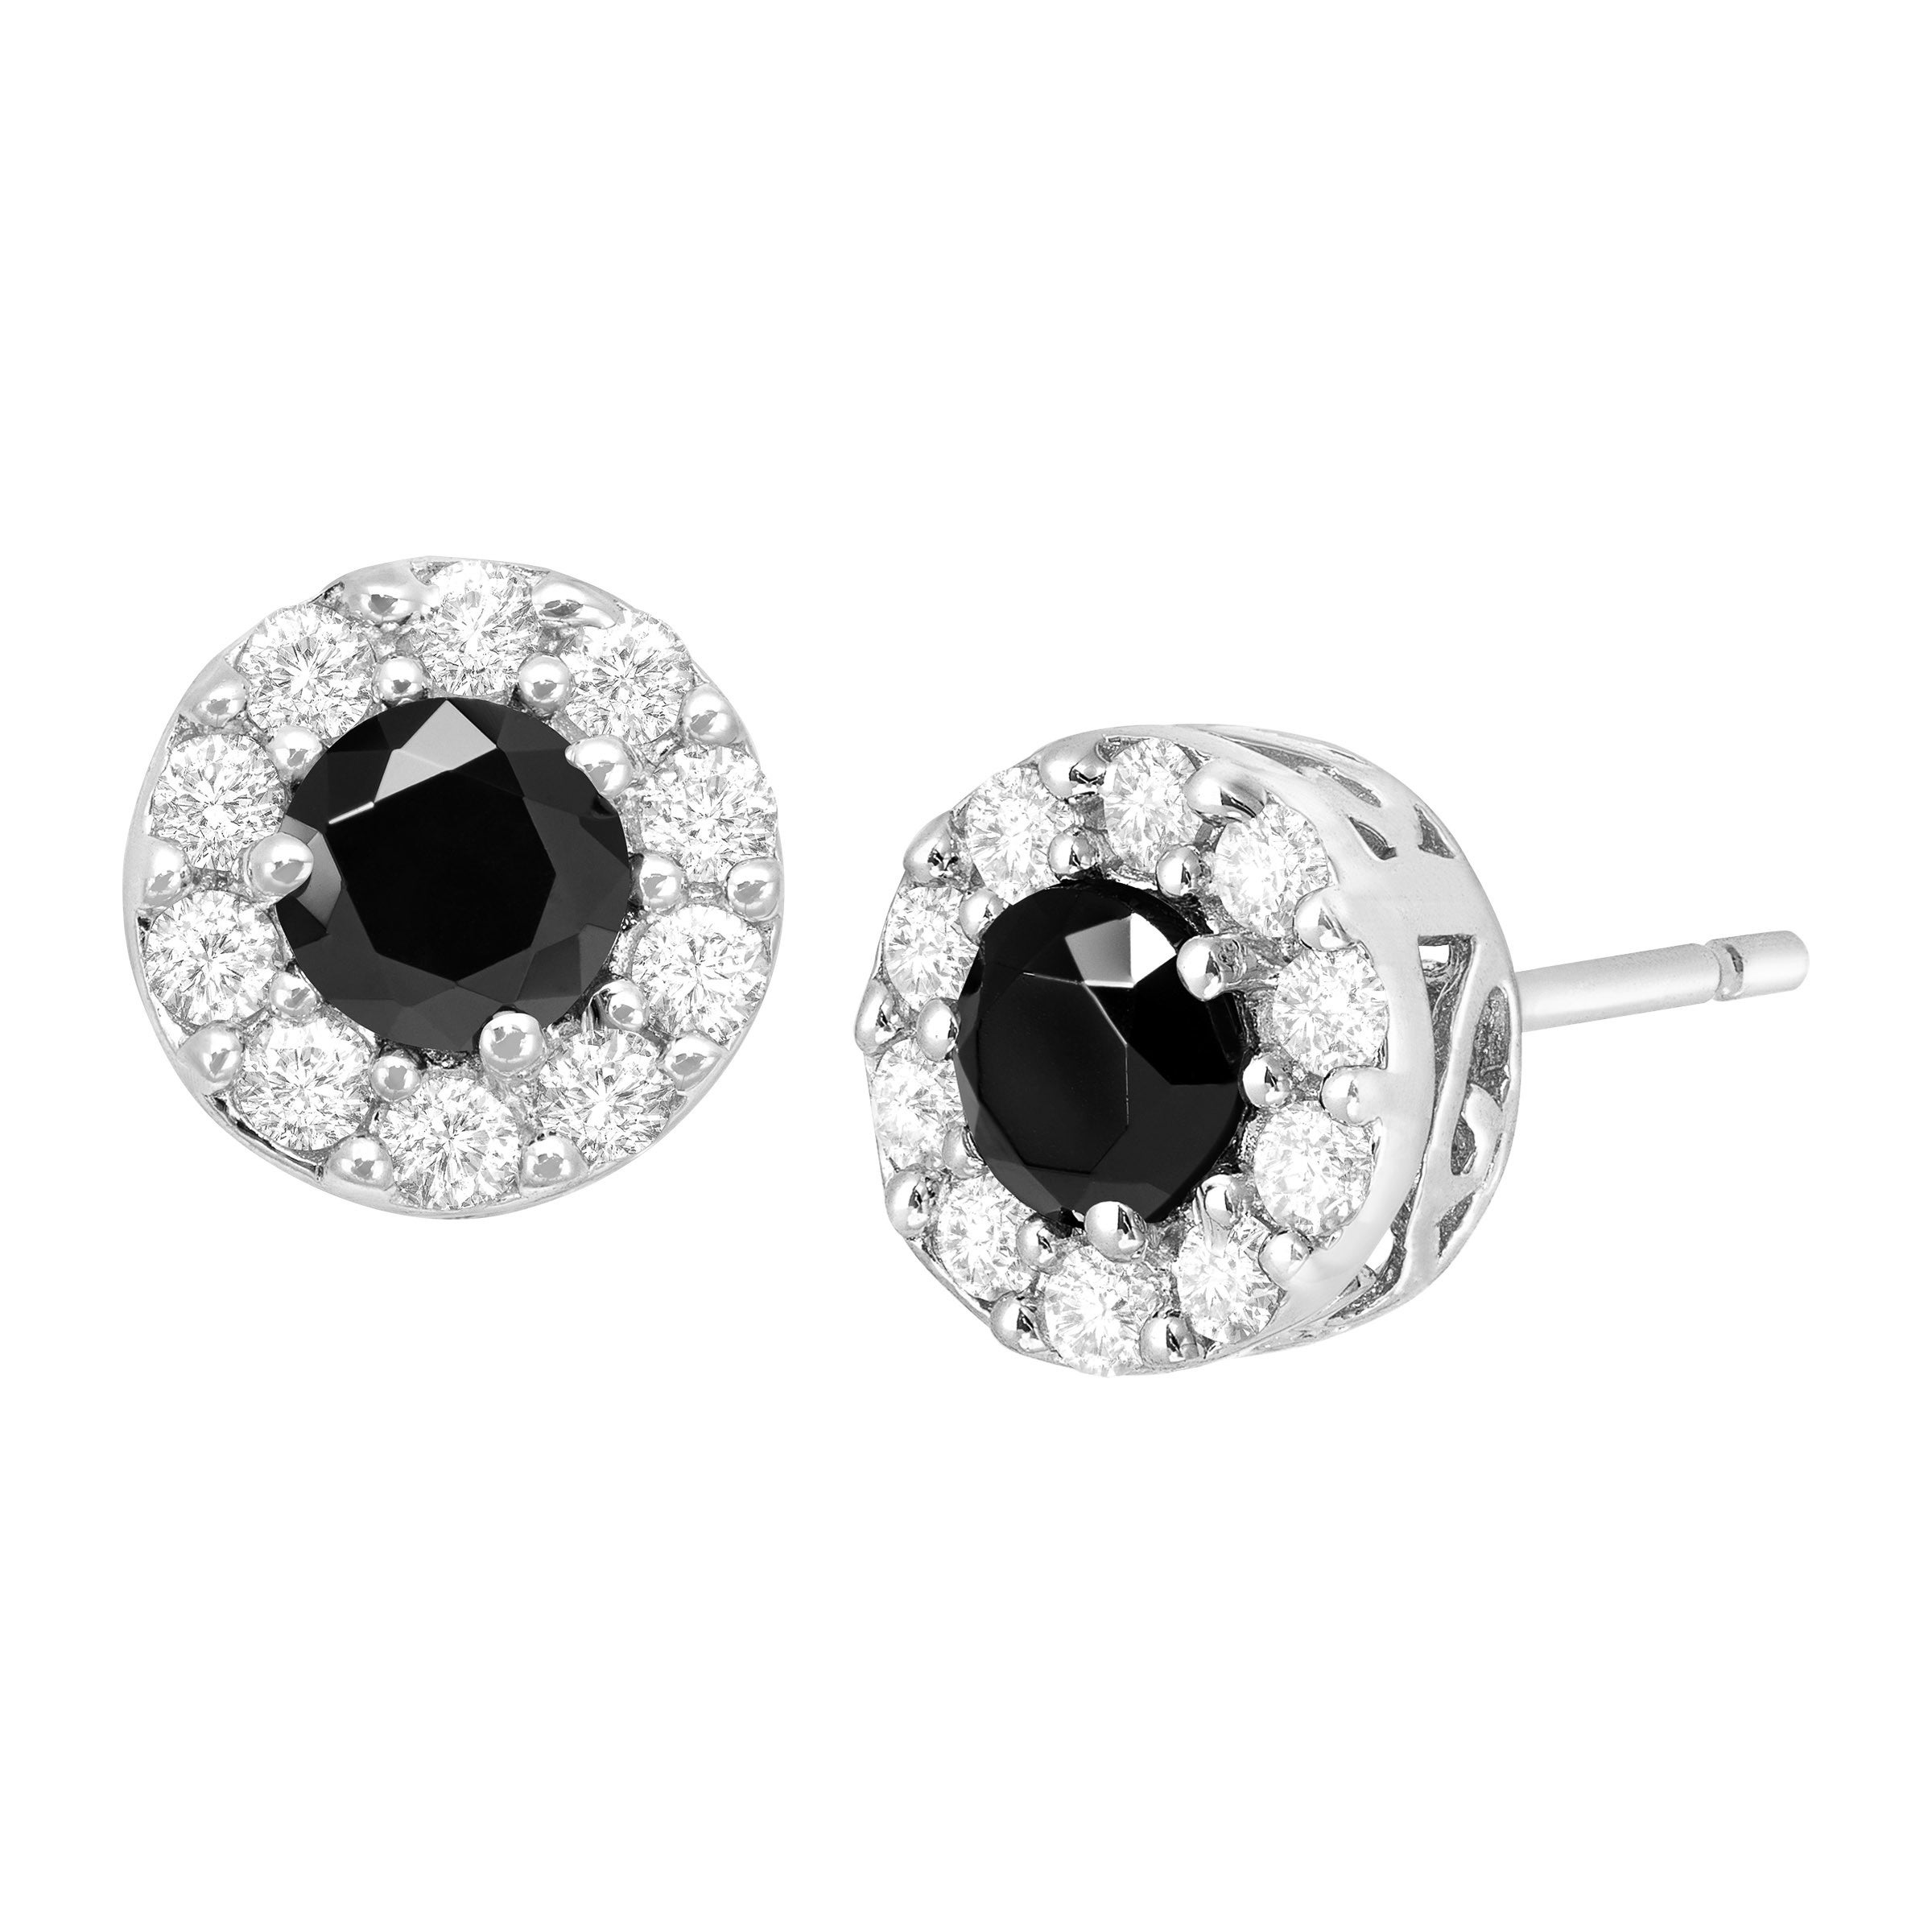 Black /& White Cubic Zirconia Halo Stud Earrings in Sterling Silver